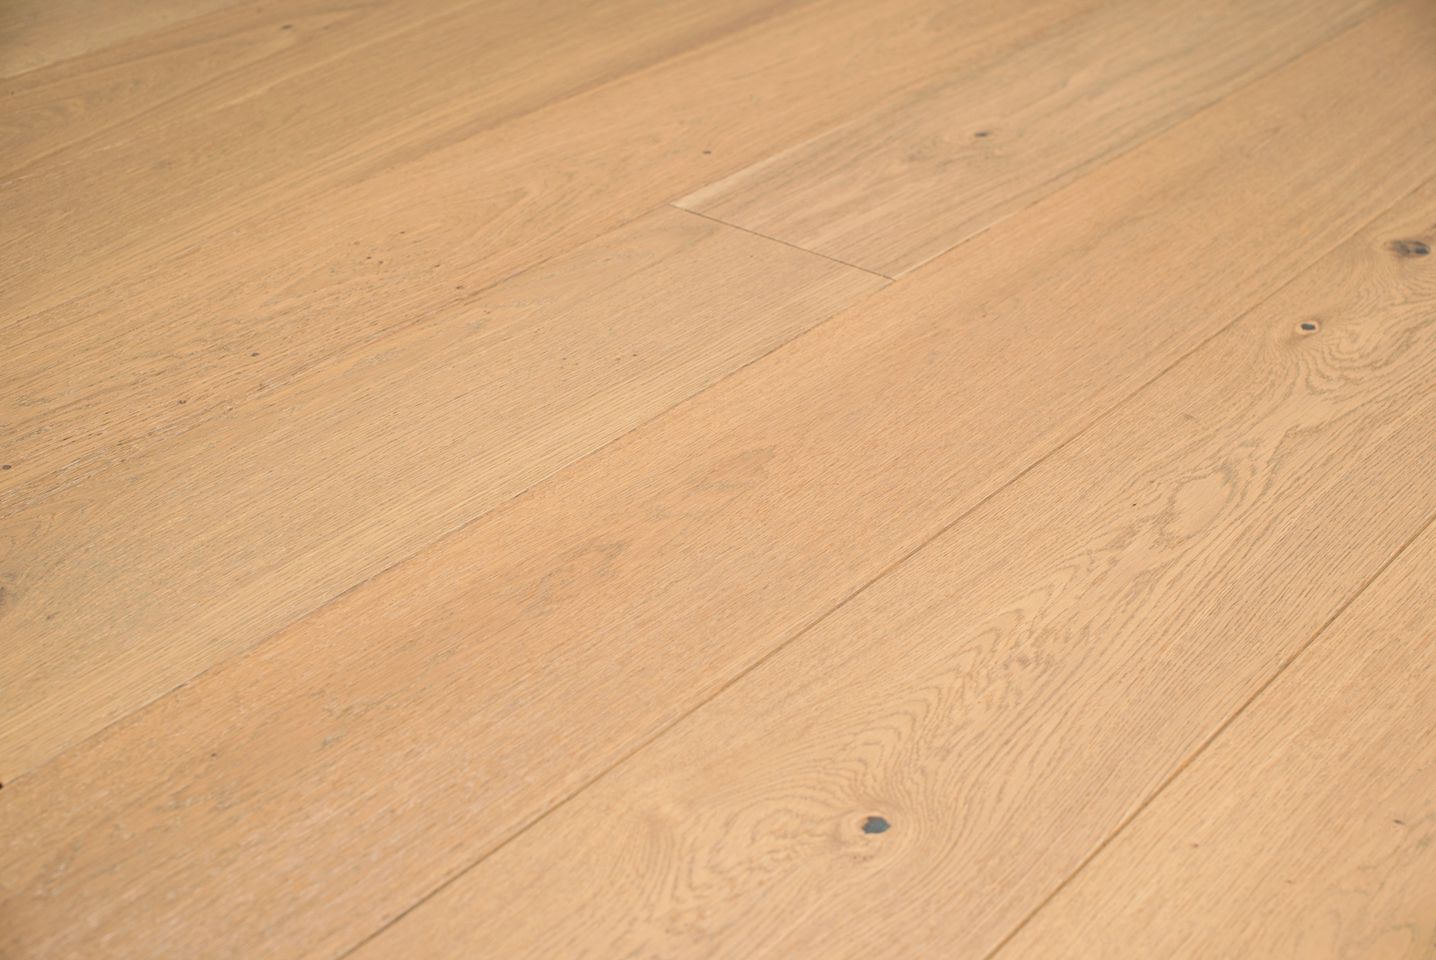 Houten Vloer Vuren : Fesca witte eiken duoplank parket vloer wit houten vloeren eik